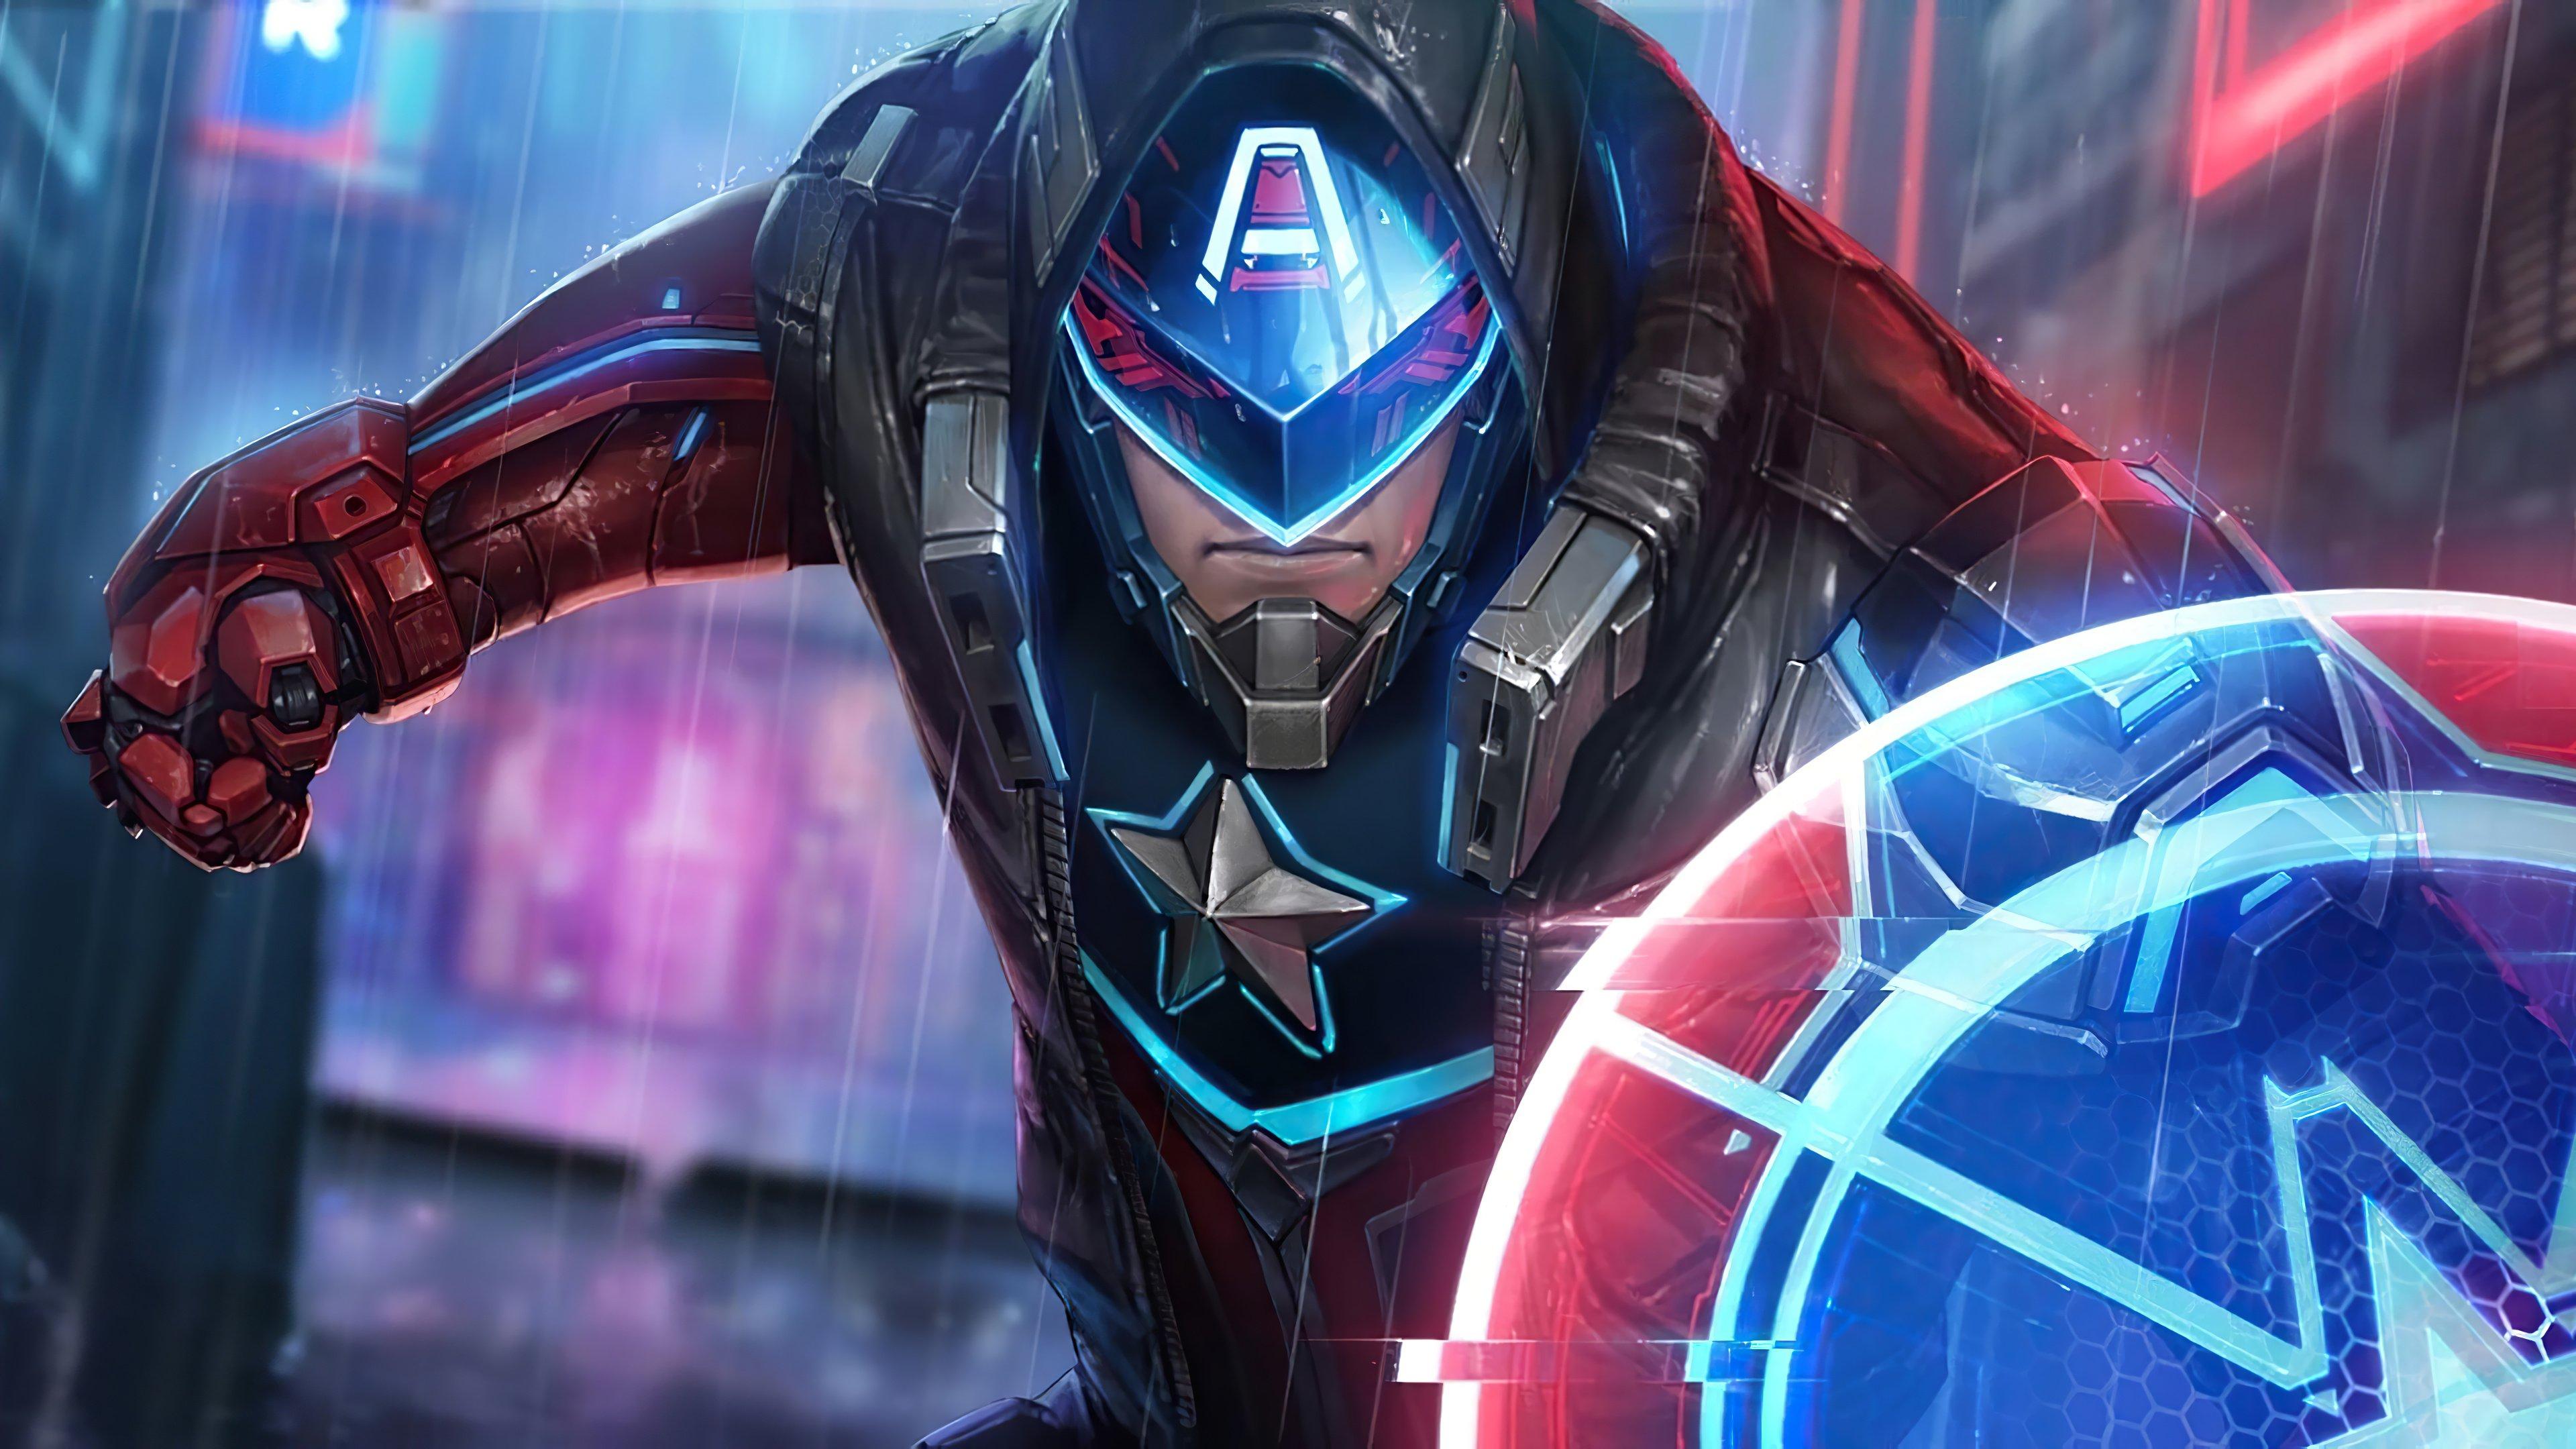 Fondos de pantalla Capitan America Future Fight